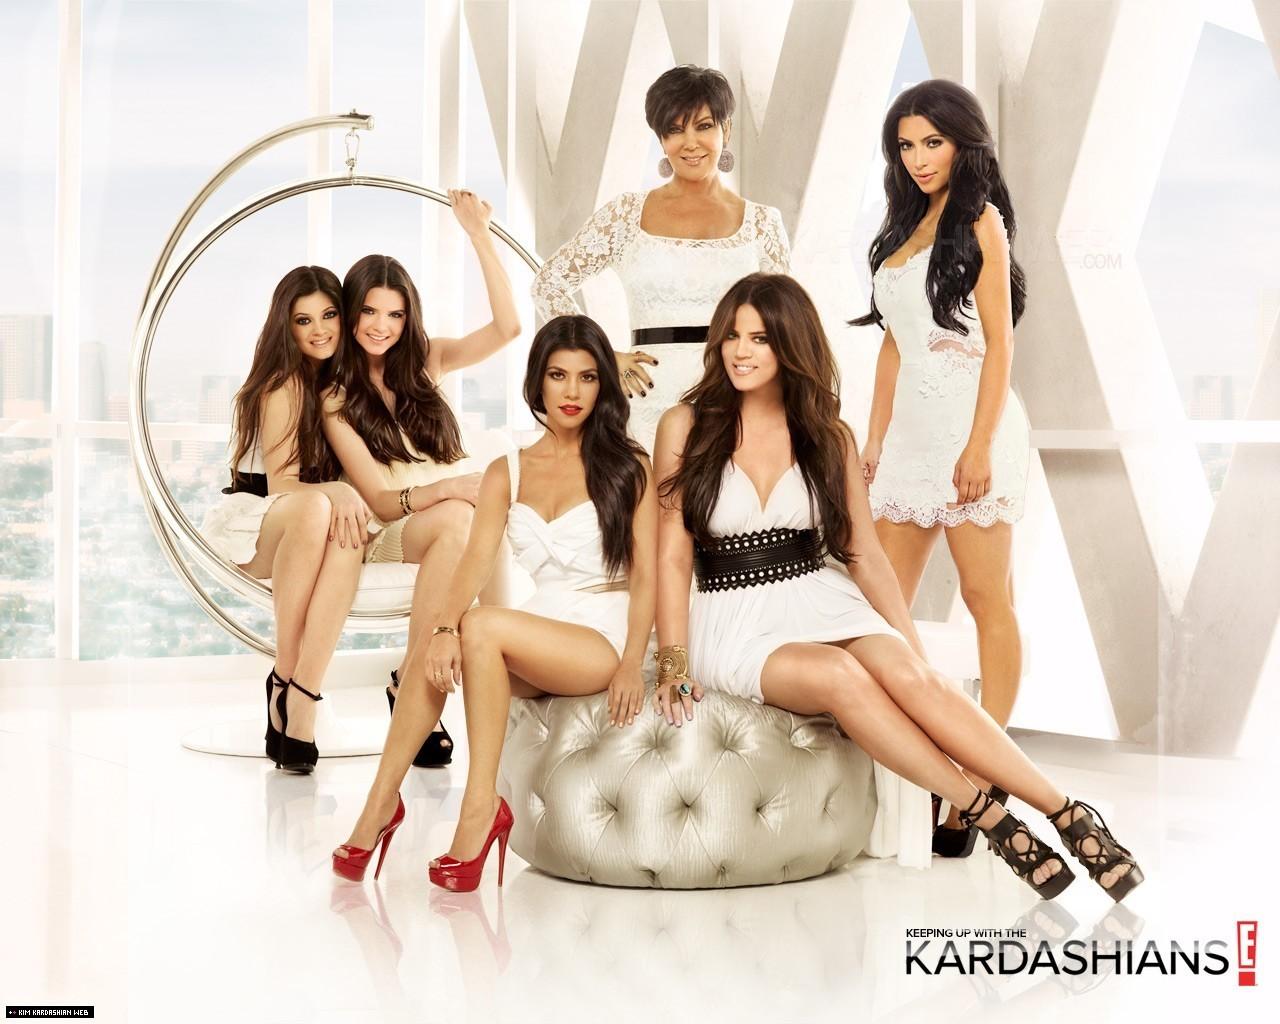 moviezone  watch keeping up with the kardashians season 8